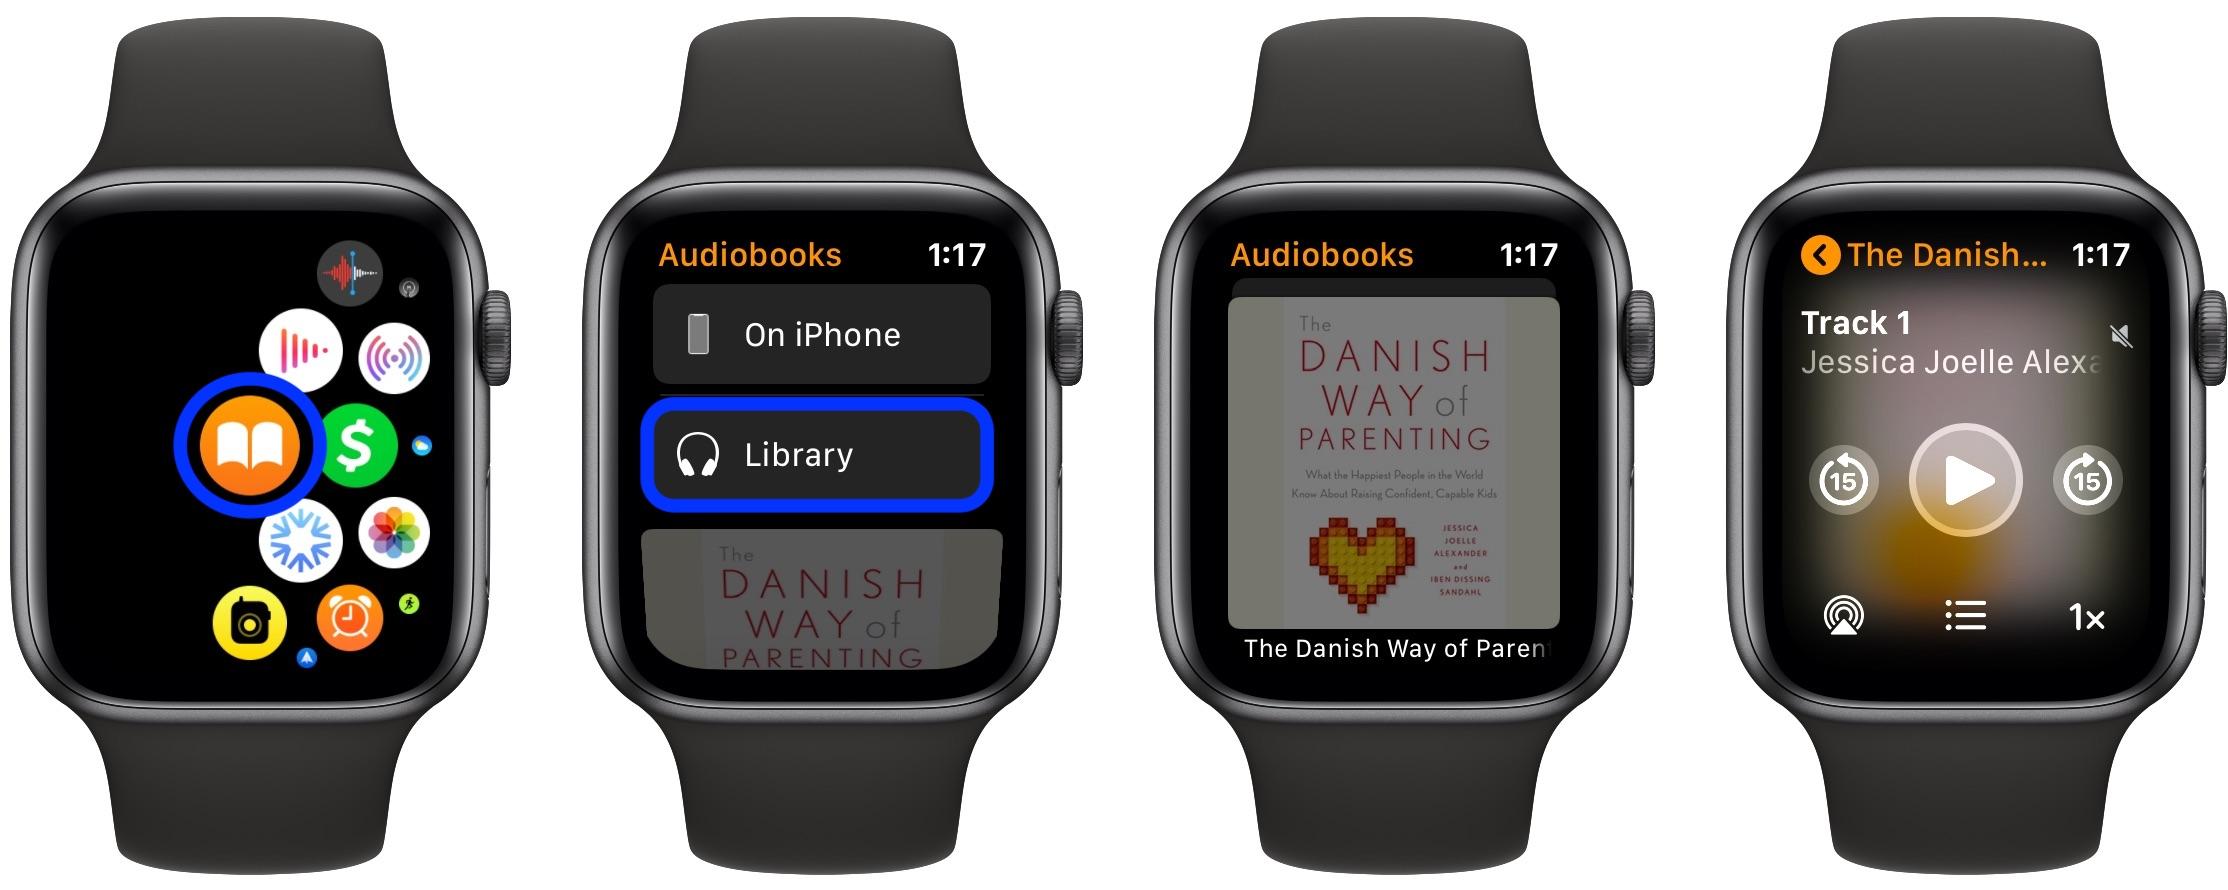 Stream Play Apple Books audiobooks Apple Watch